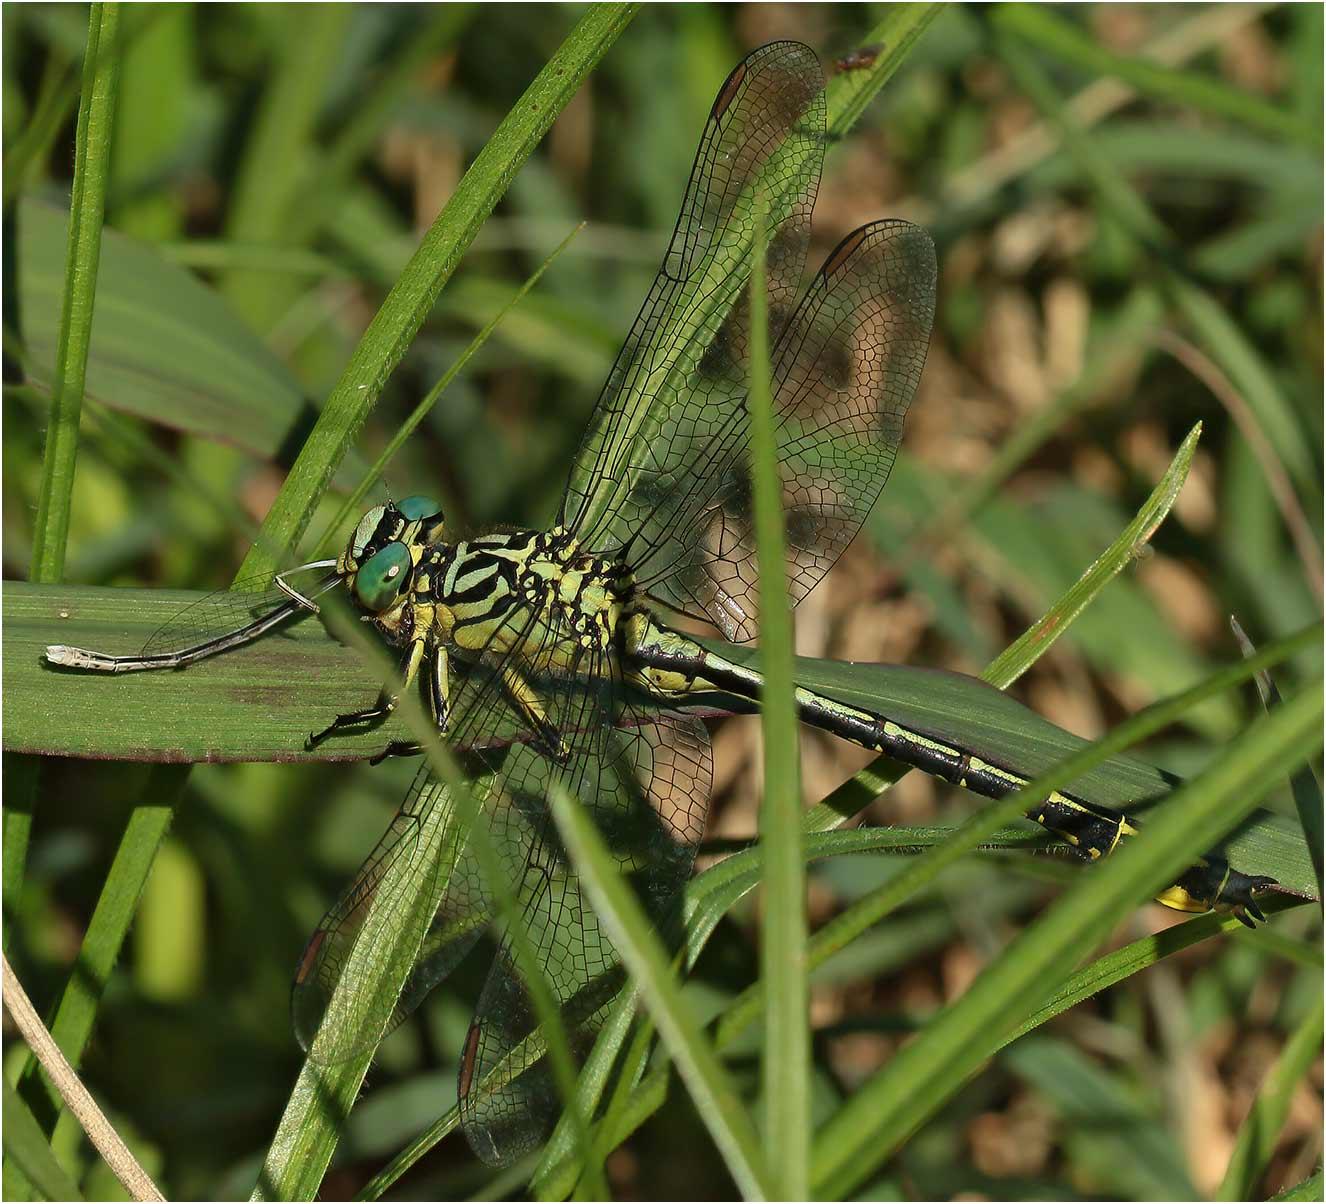 Stylurus flavipes mâle, Sort-en-Chalosse (France-40), 06/07/2020